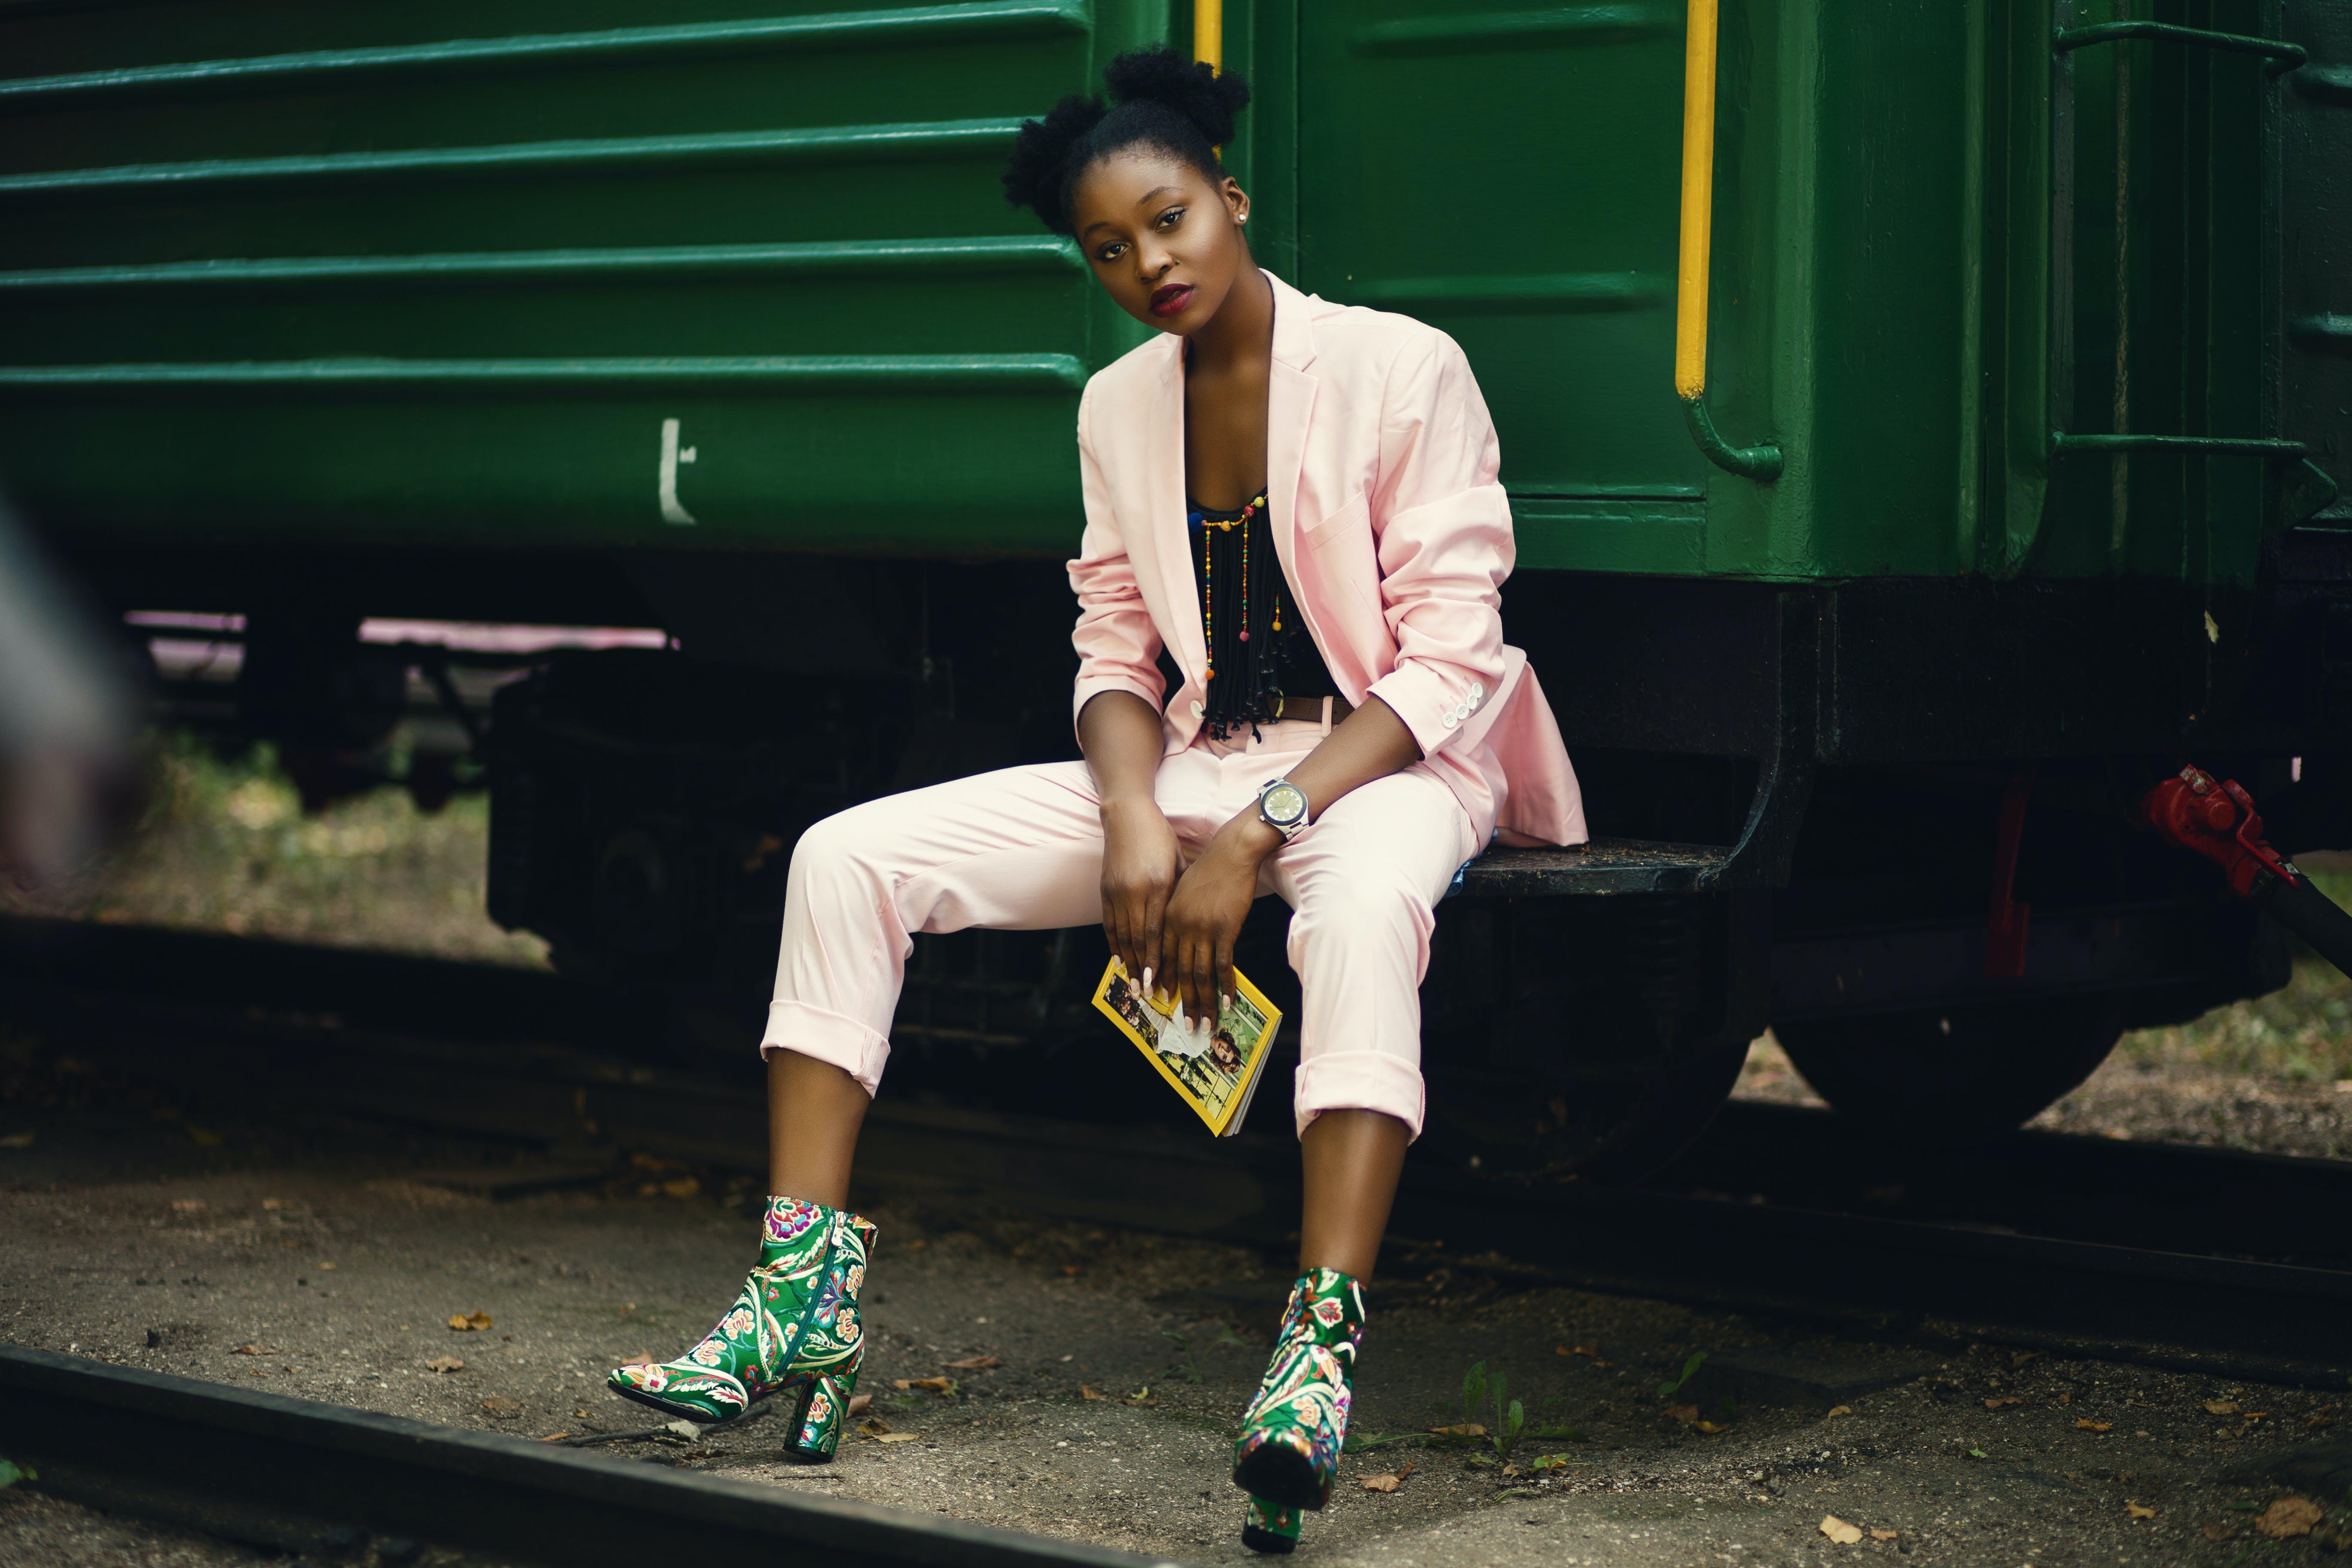 Woman in Pink Blazer Sitting on Green Train